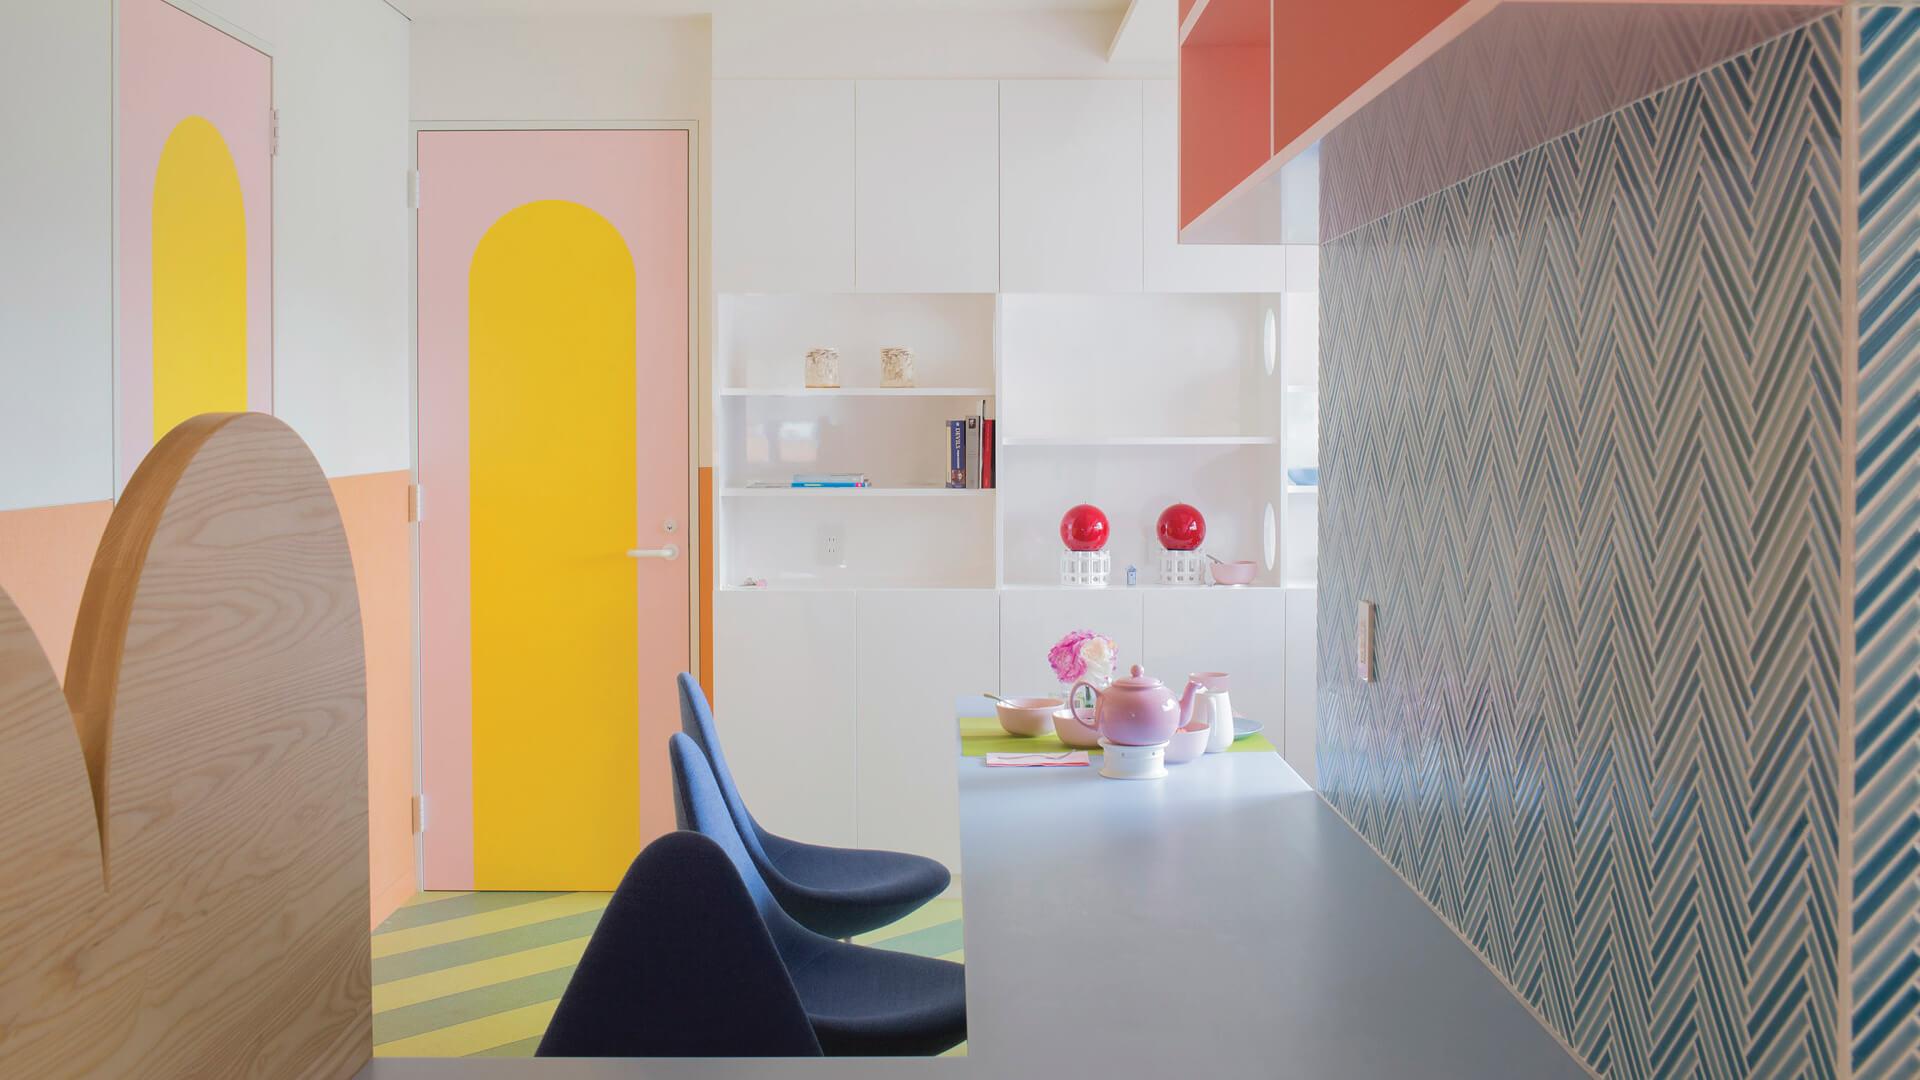 Nagatacho Apartment designed by Adam Nathaniel Furman in Tokyo, Japan | Nagatacho Apartment designed by Adam Nathaniel Furman | STIRworld